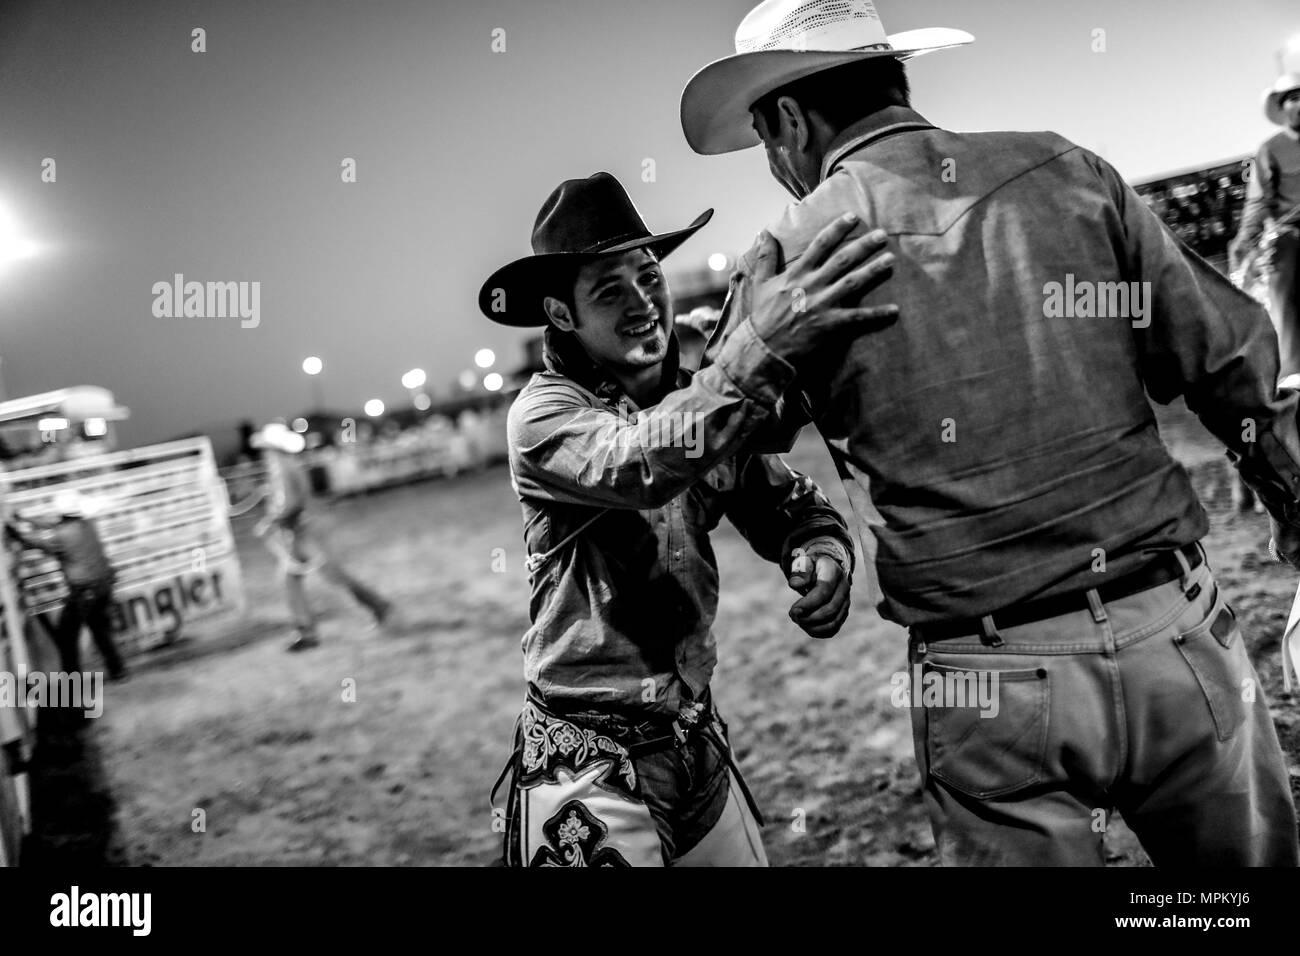 07bb843f24301 Rodeo Expogan 20mayo2018. (Photo  NortePhoto   Luis Gutierrez) Cowboys  sport